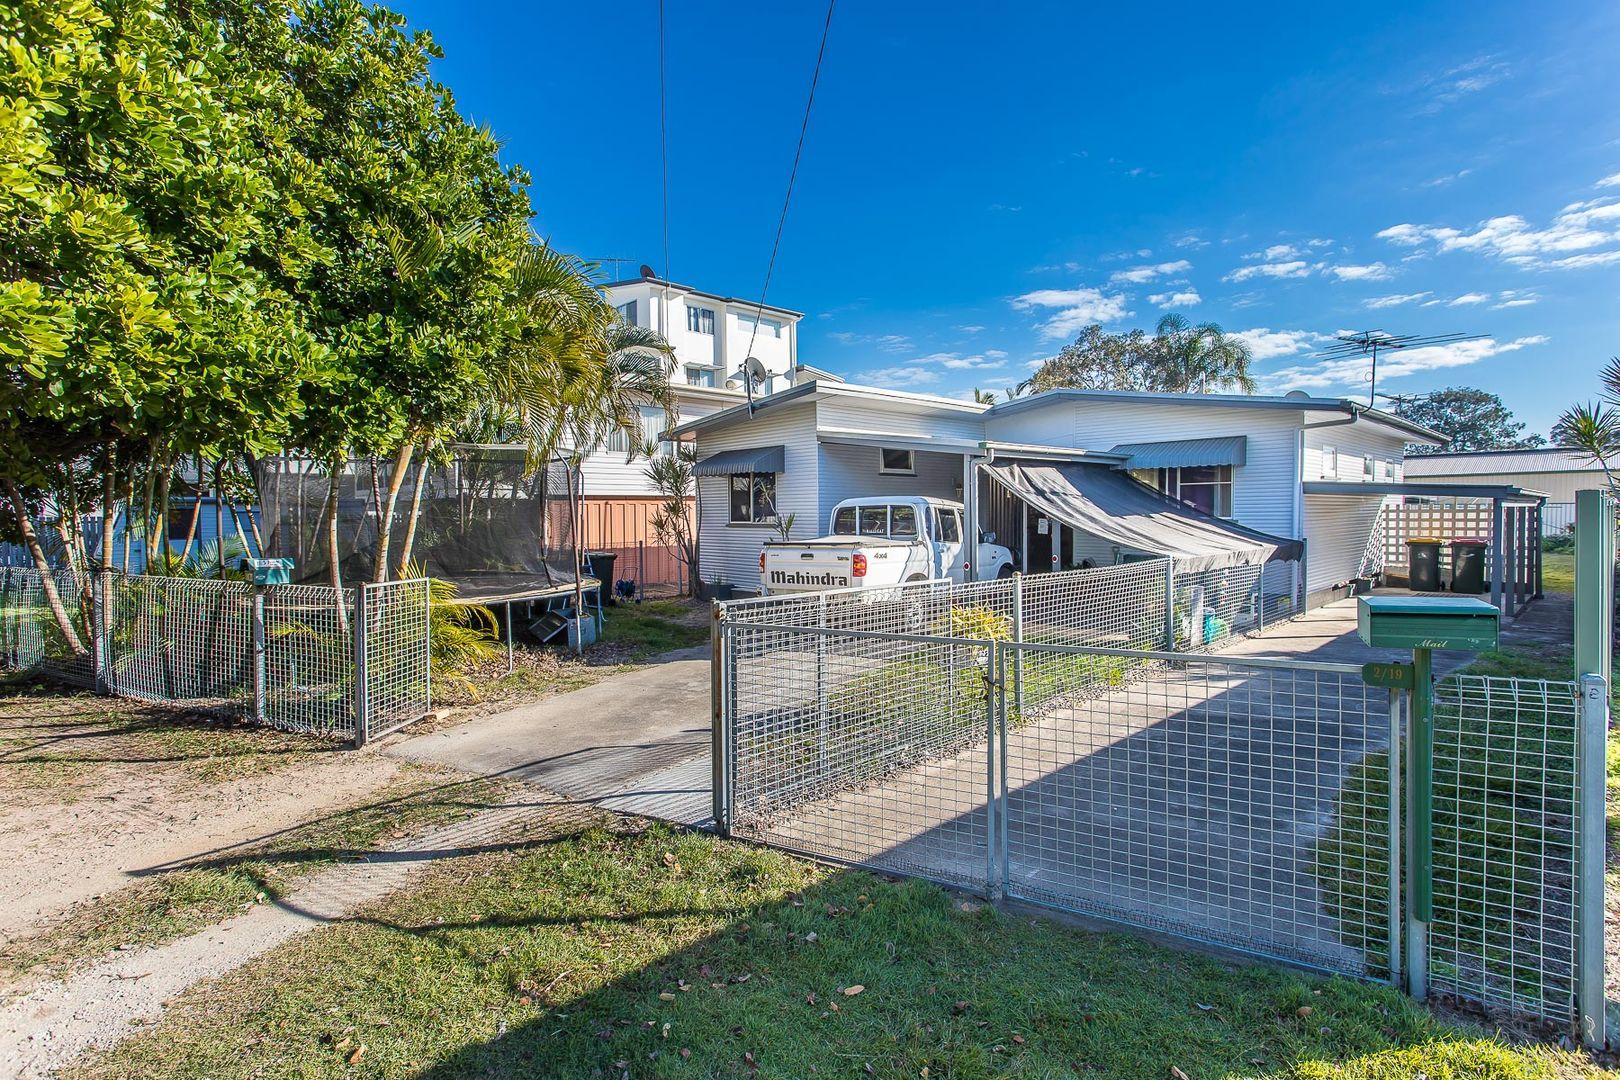 19a/19b Lane St, Clontarf QLD 4019, Image 1